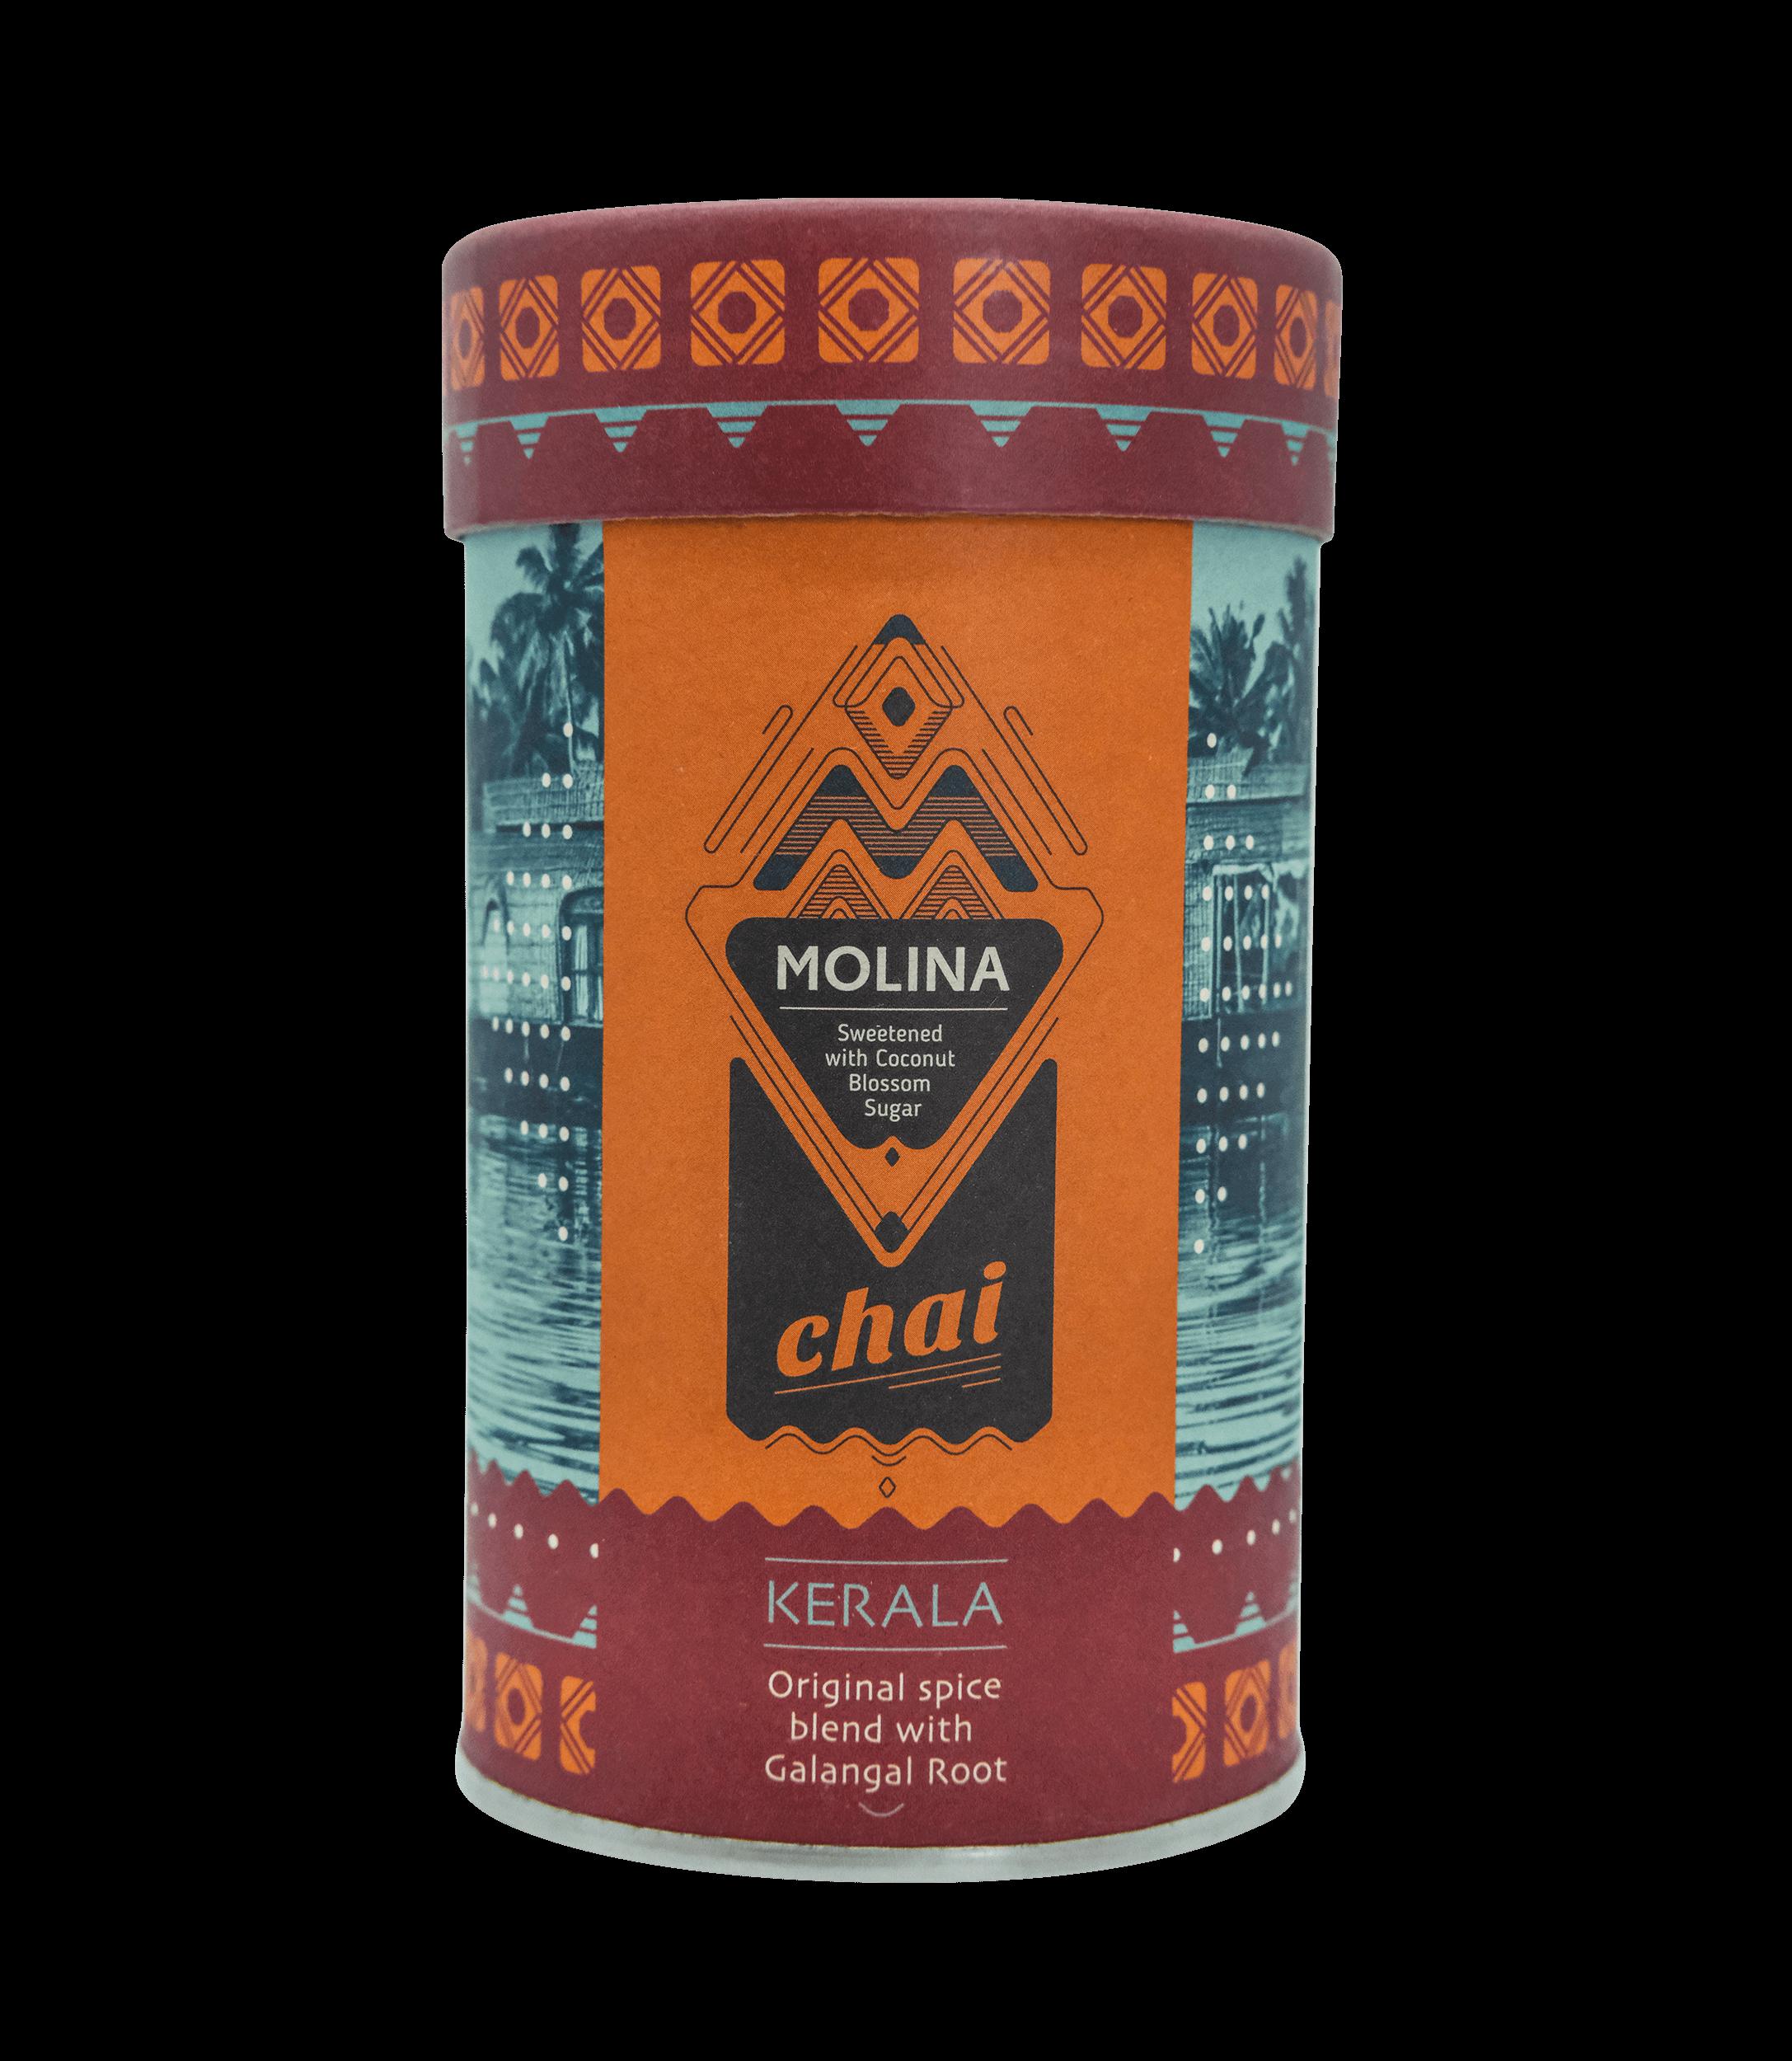 Molina Chai Kerala